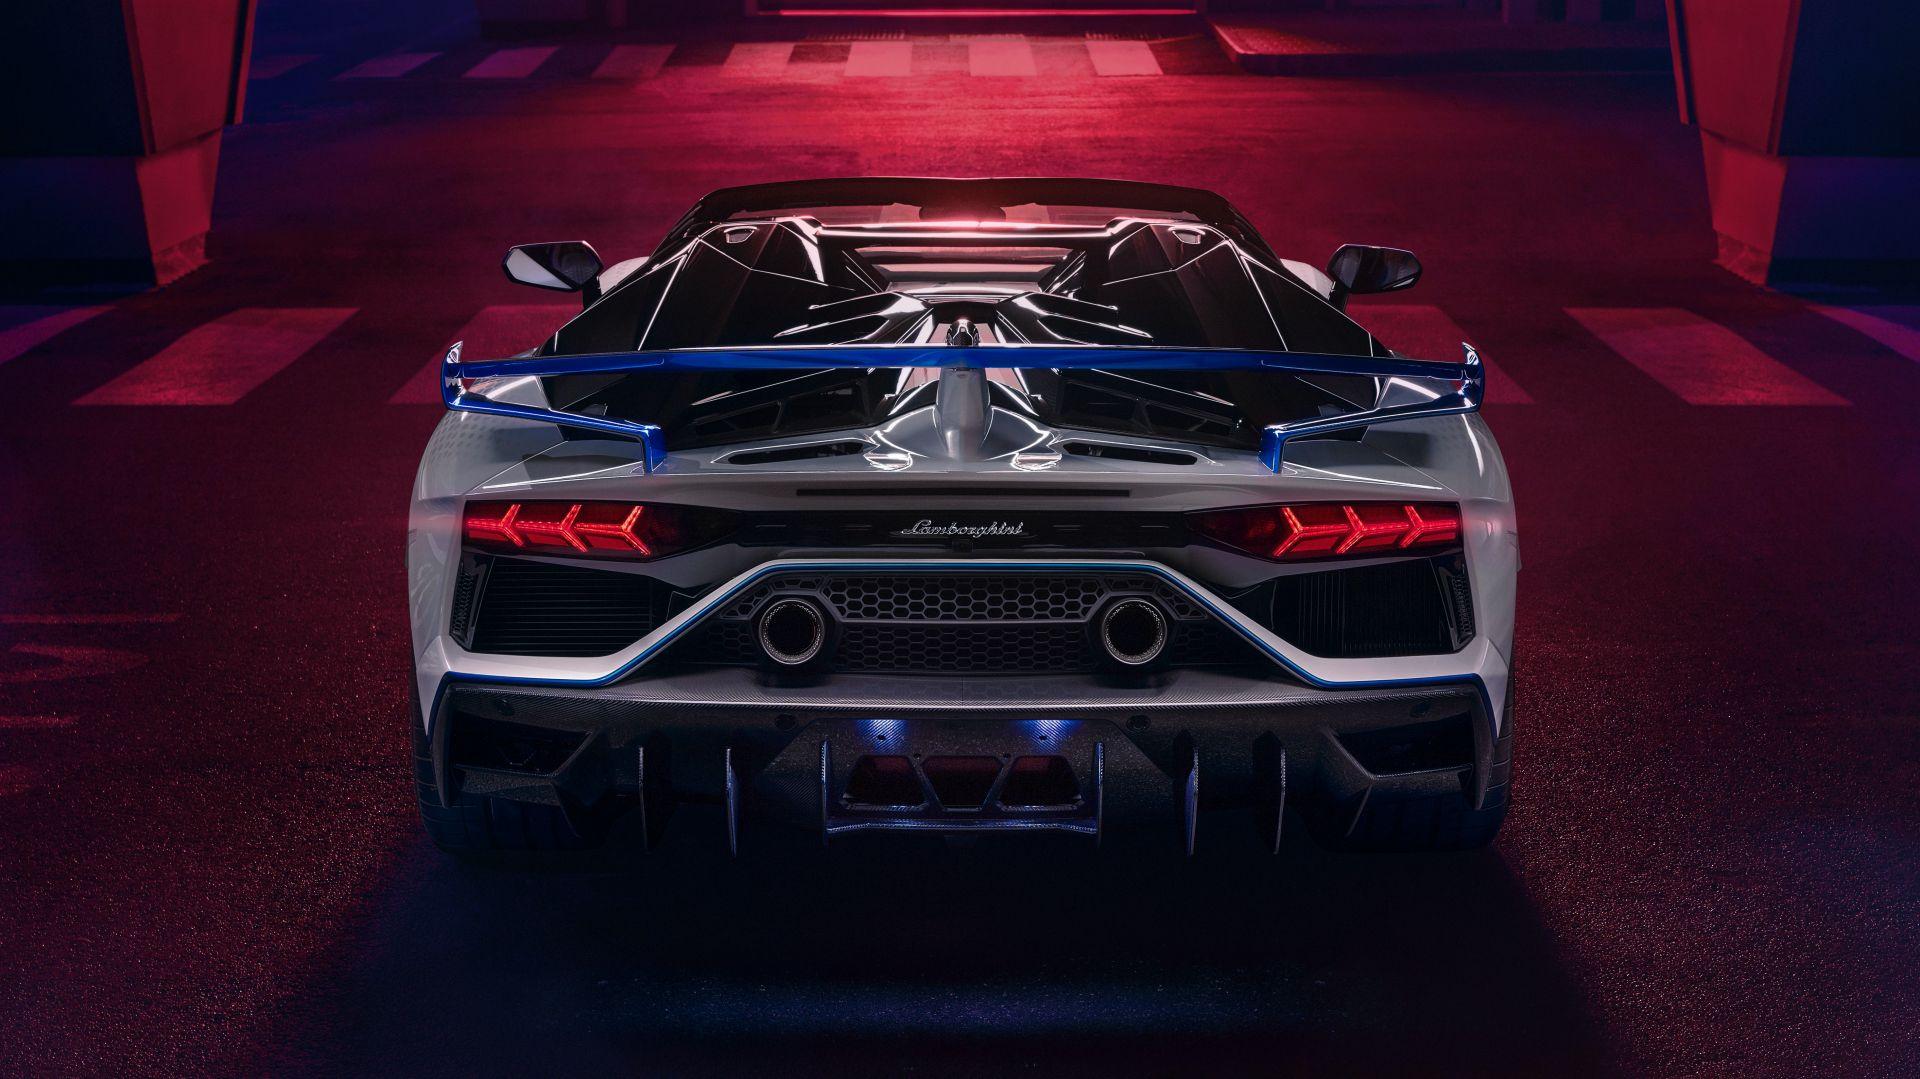 Lamborghini-Aventador-SVJ-Xago-Edition-5